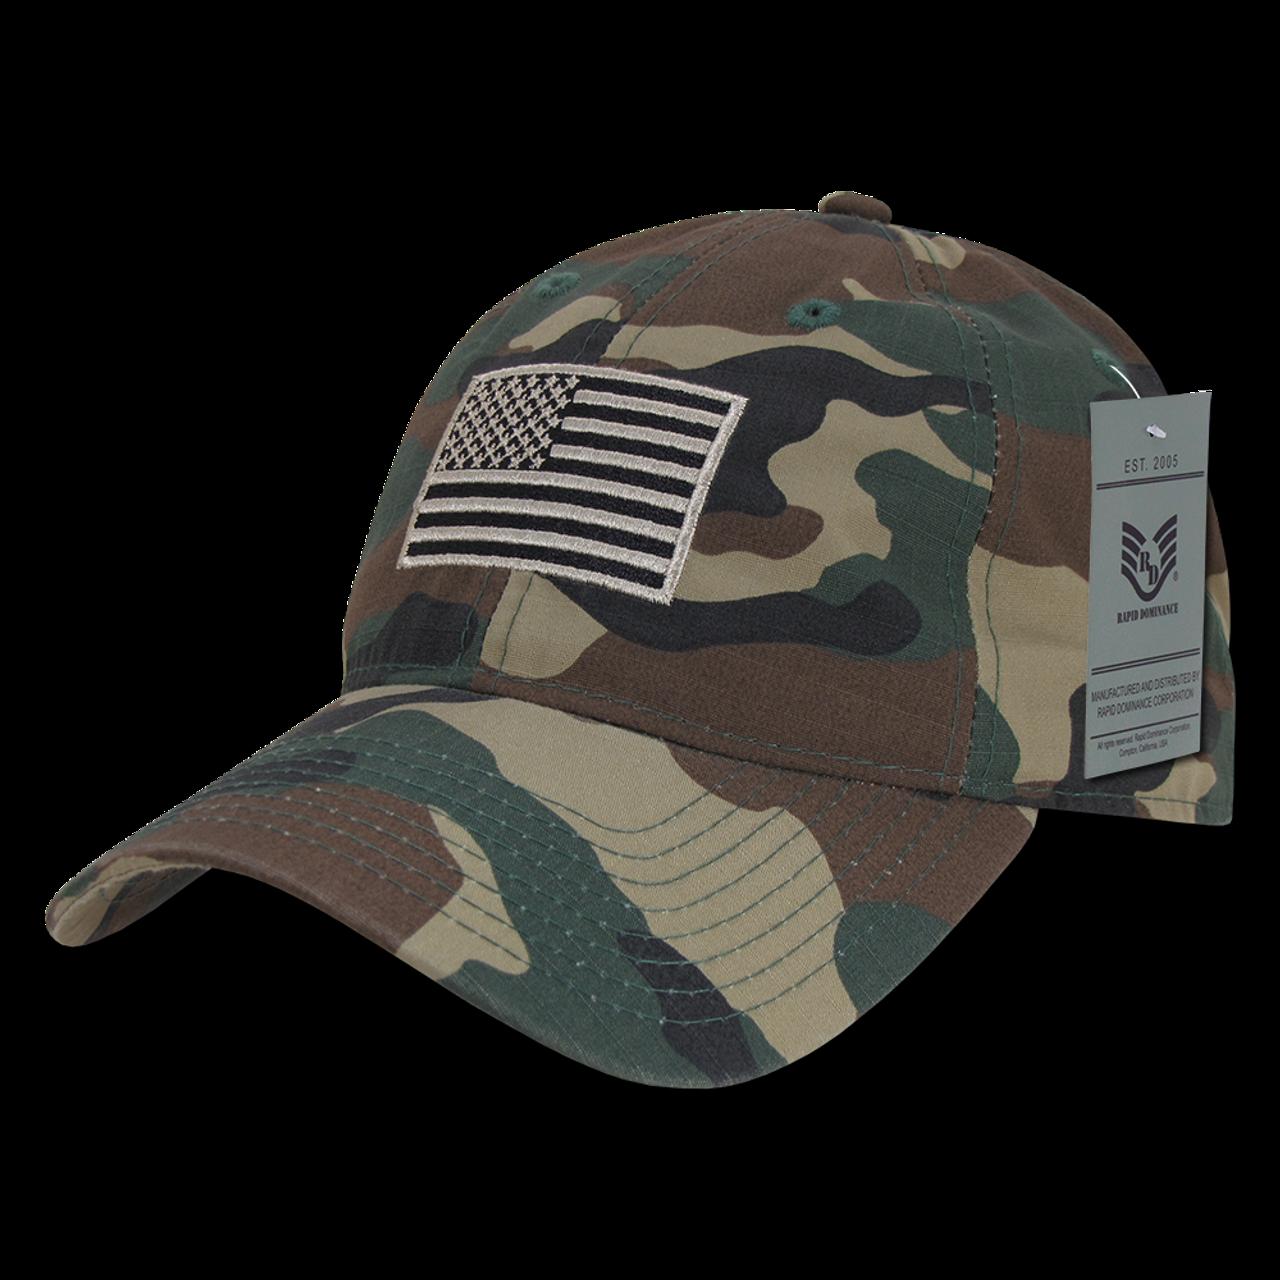 e4b2bdf7716a0 S73 - USA Flag Cap - Relaxed Ripstop - Cotton - Woodland Camouflage -  USMILITARYHATS.COM